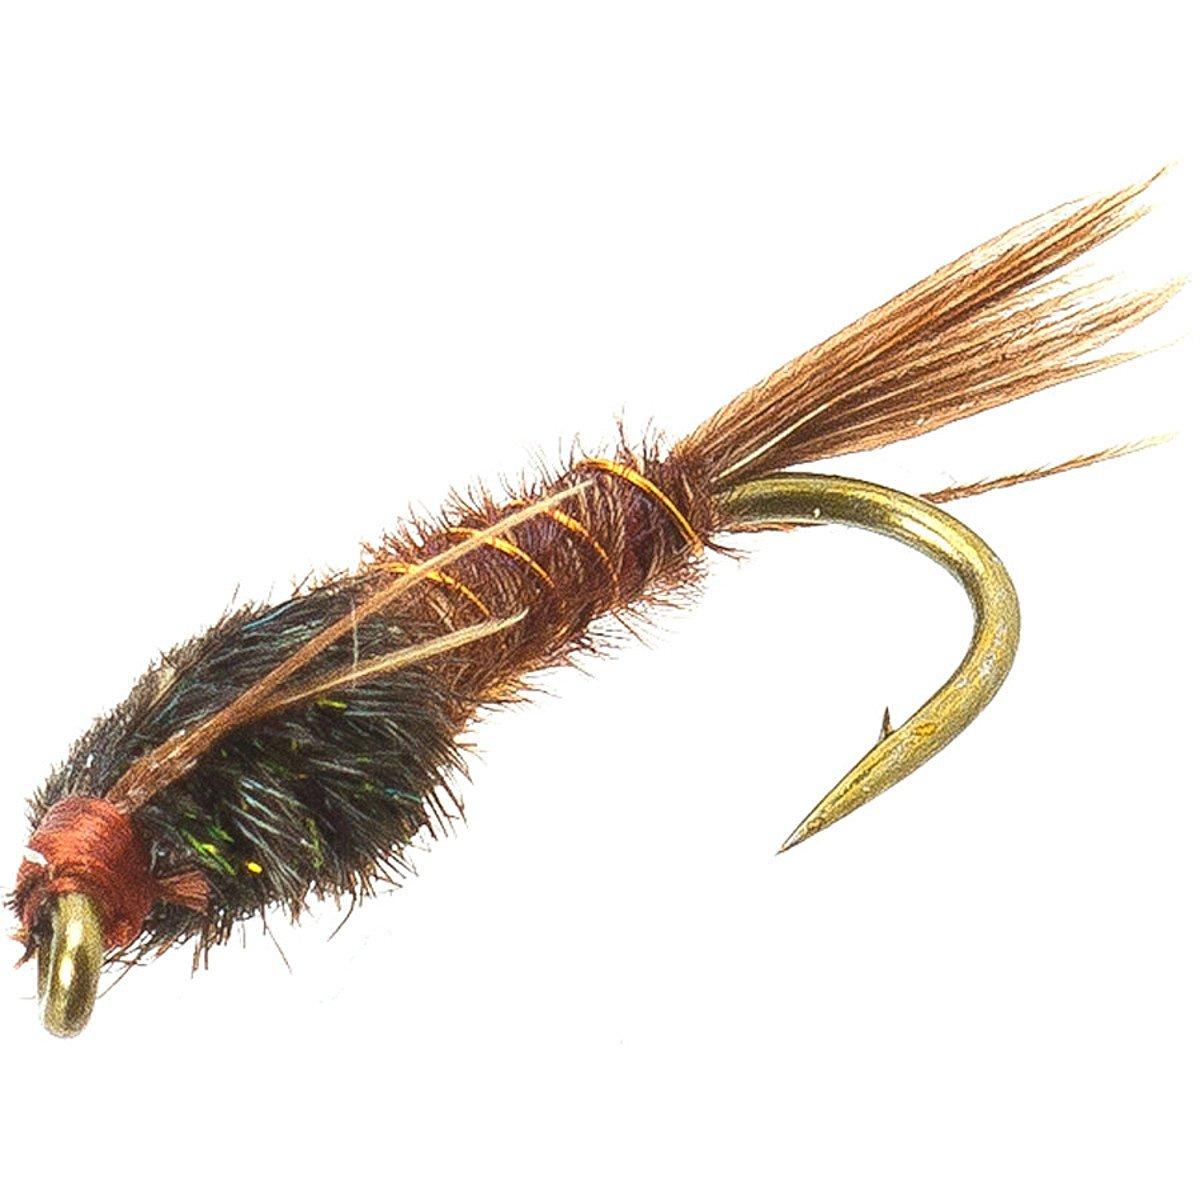 Umpqua Quasimodo Pheasant Tail Flies